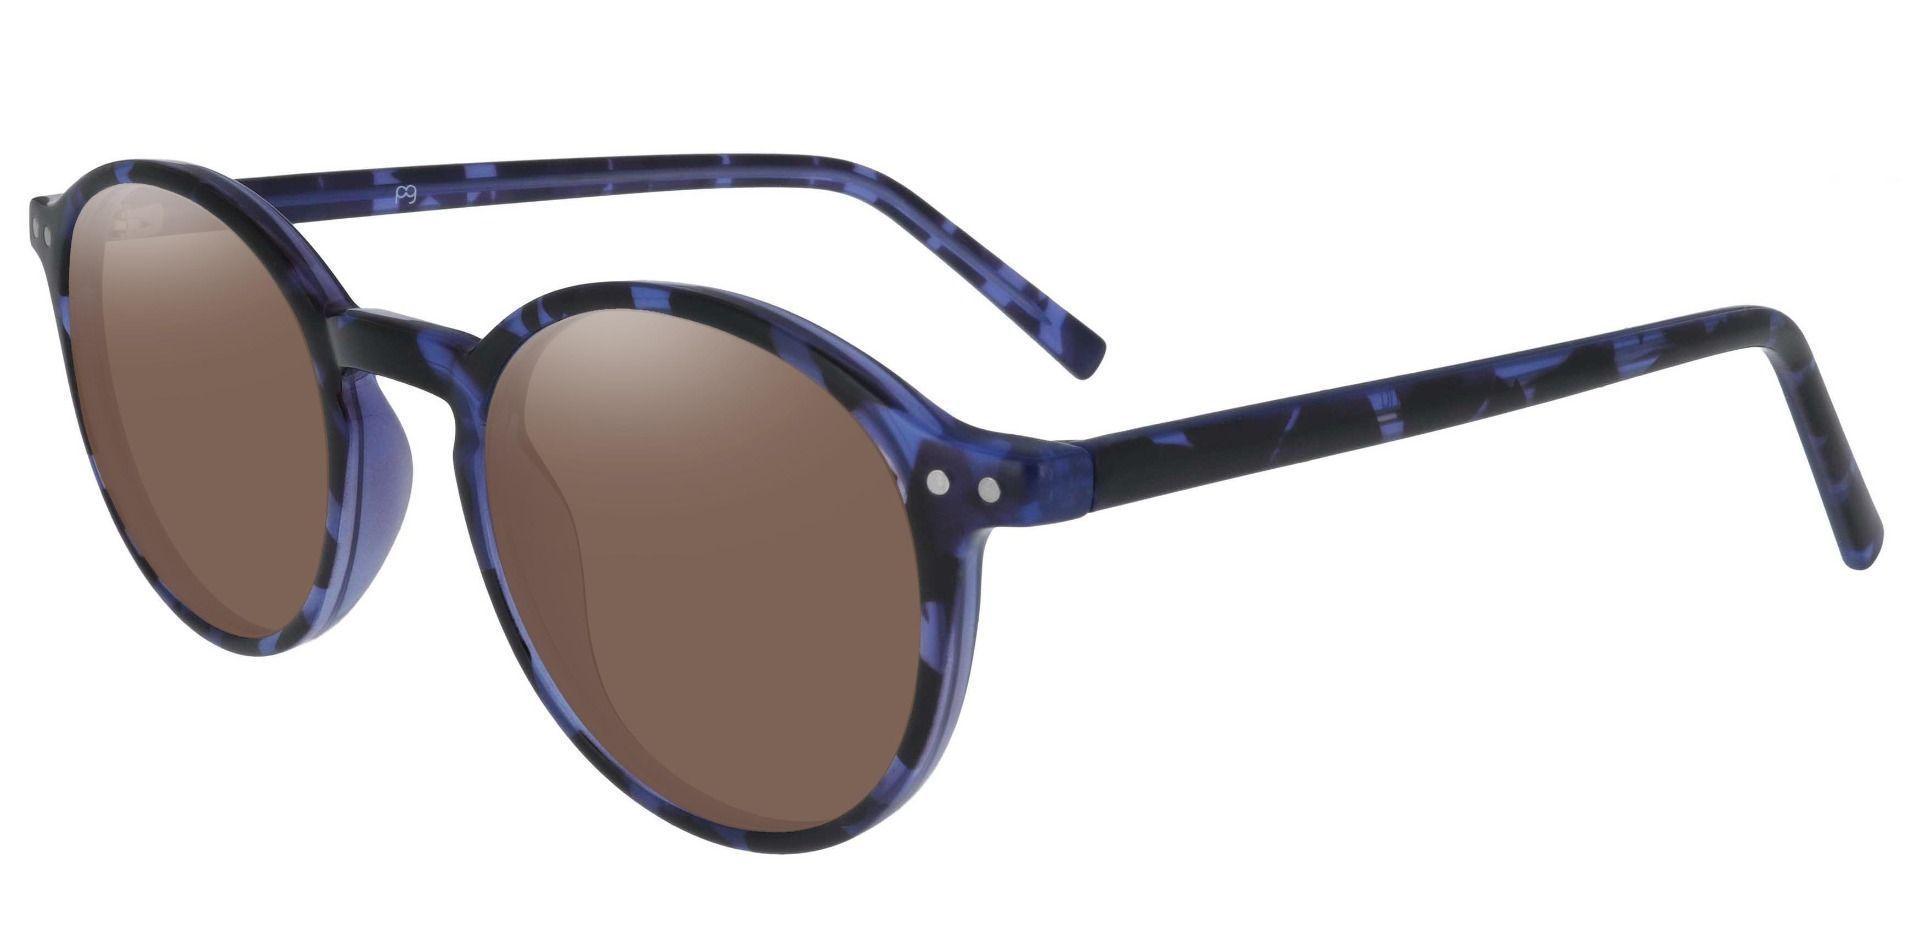 Harvard Round Prescription Sunglasses - Blue Frame With Brown Lenses